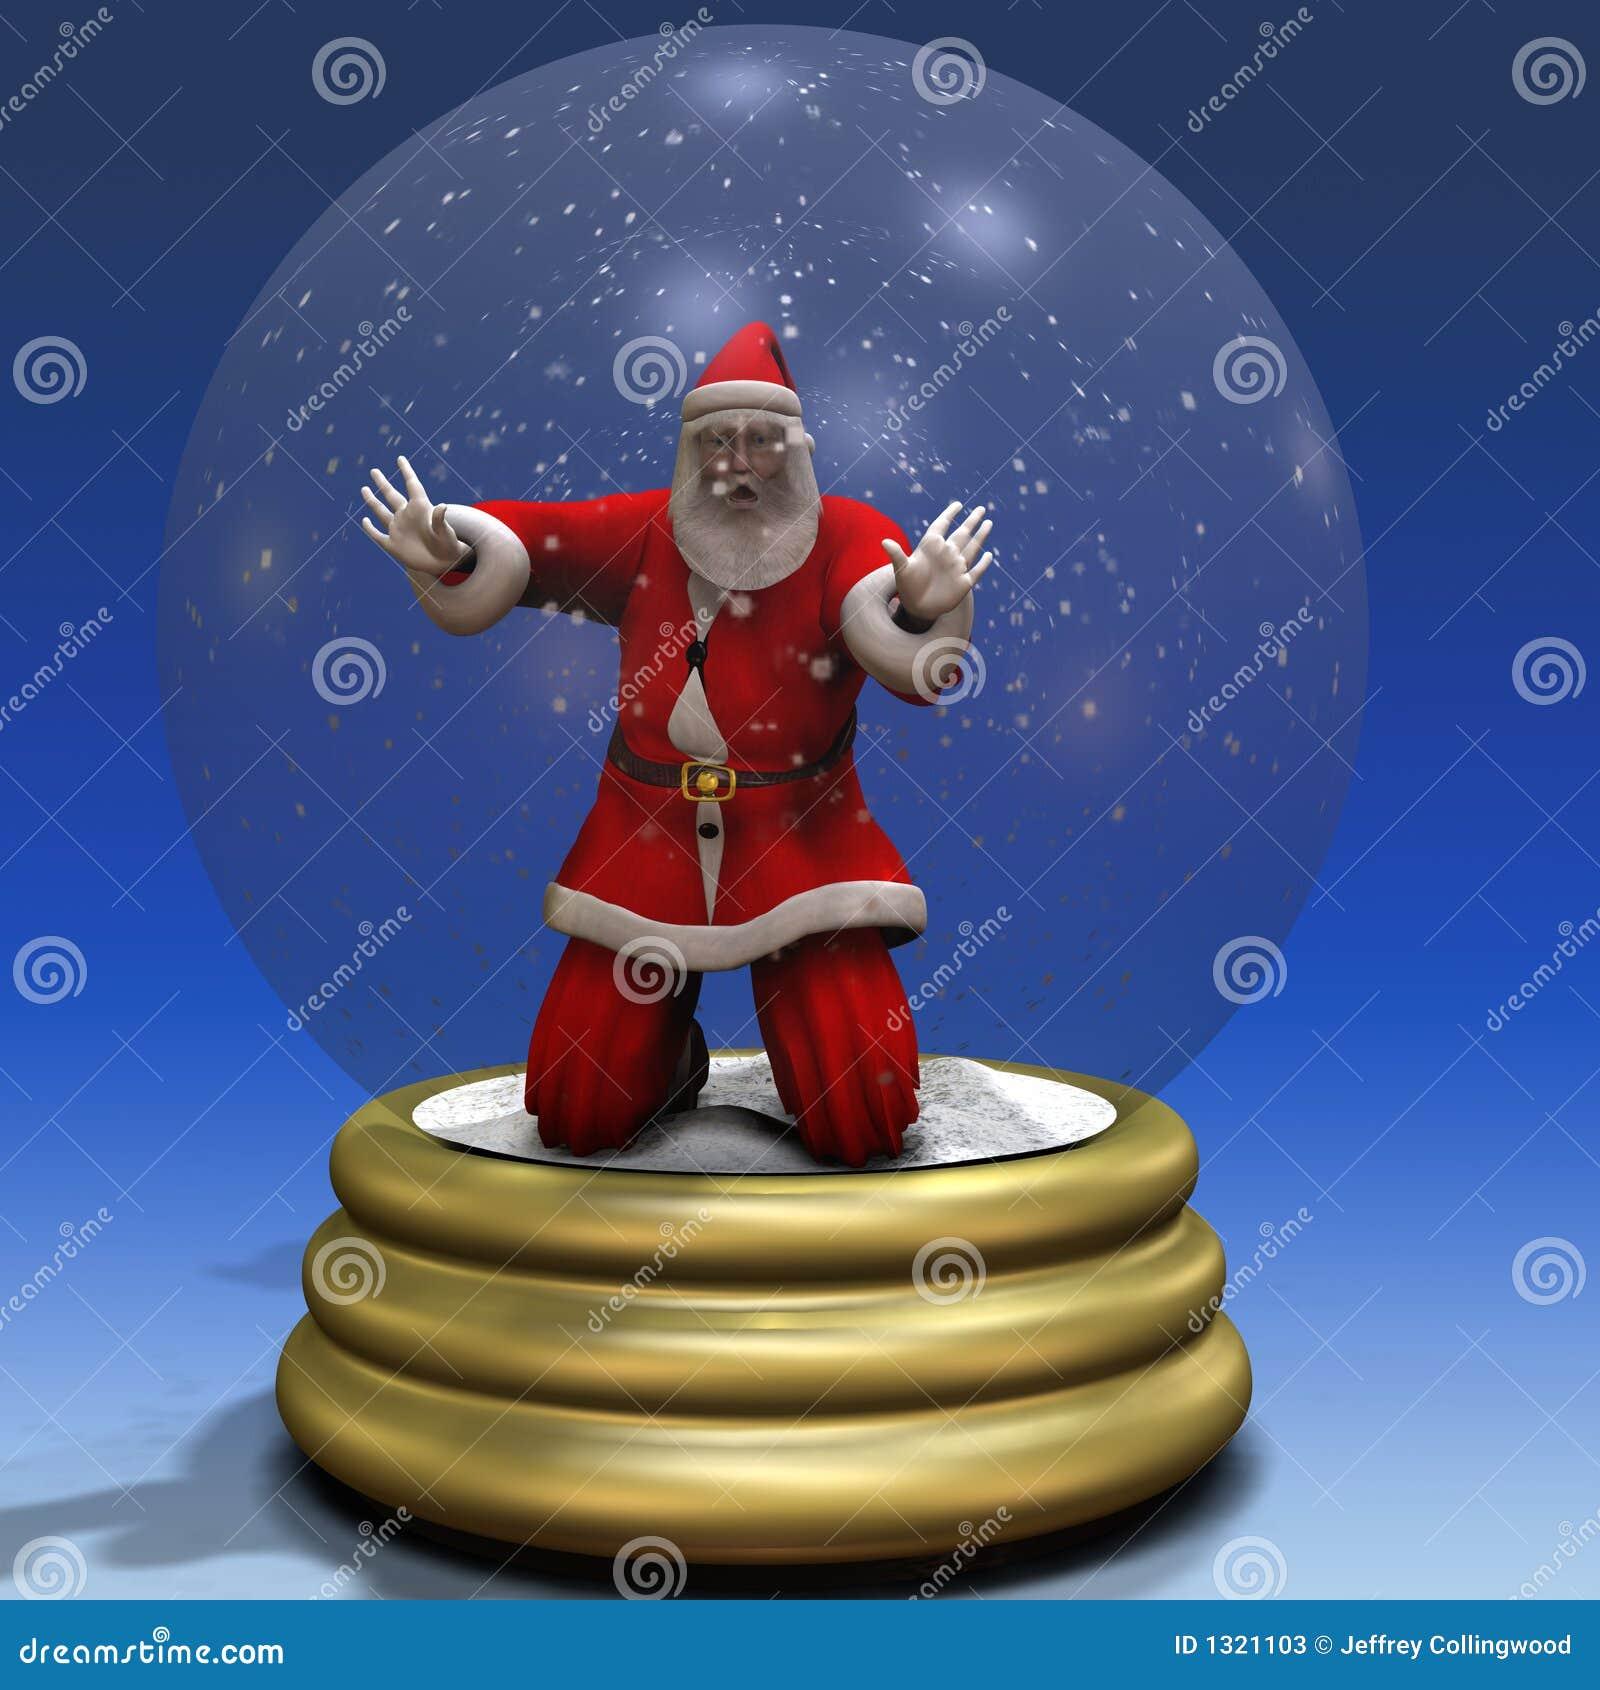 Santa Trapped In Snow Globe 3 Stock Photos Image 1321103